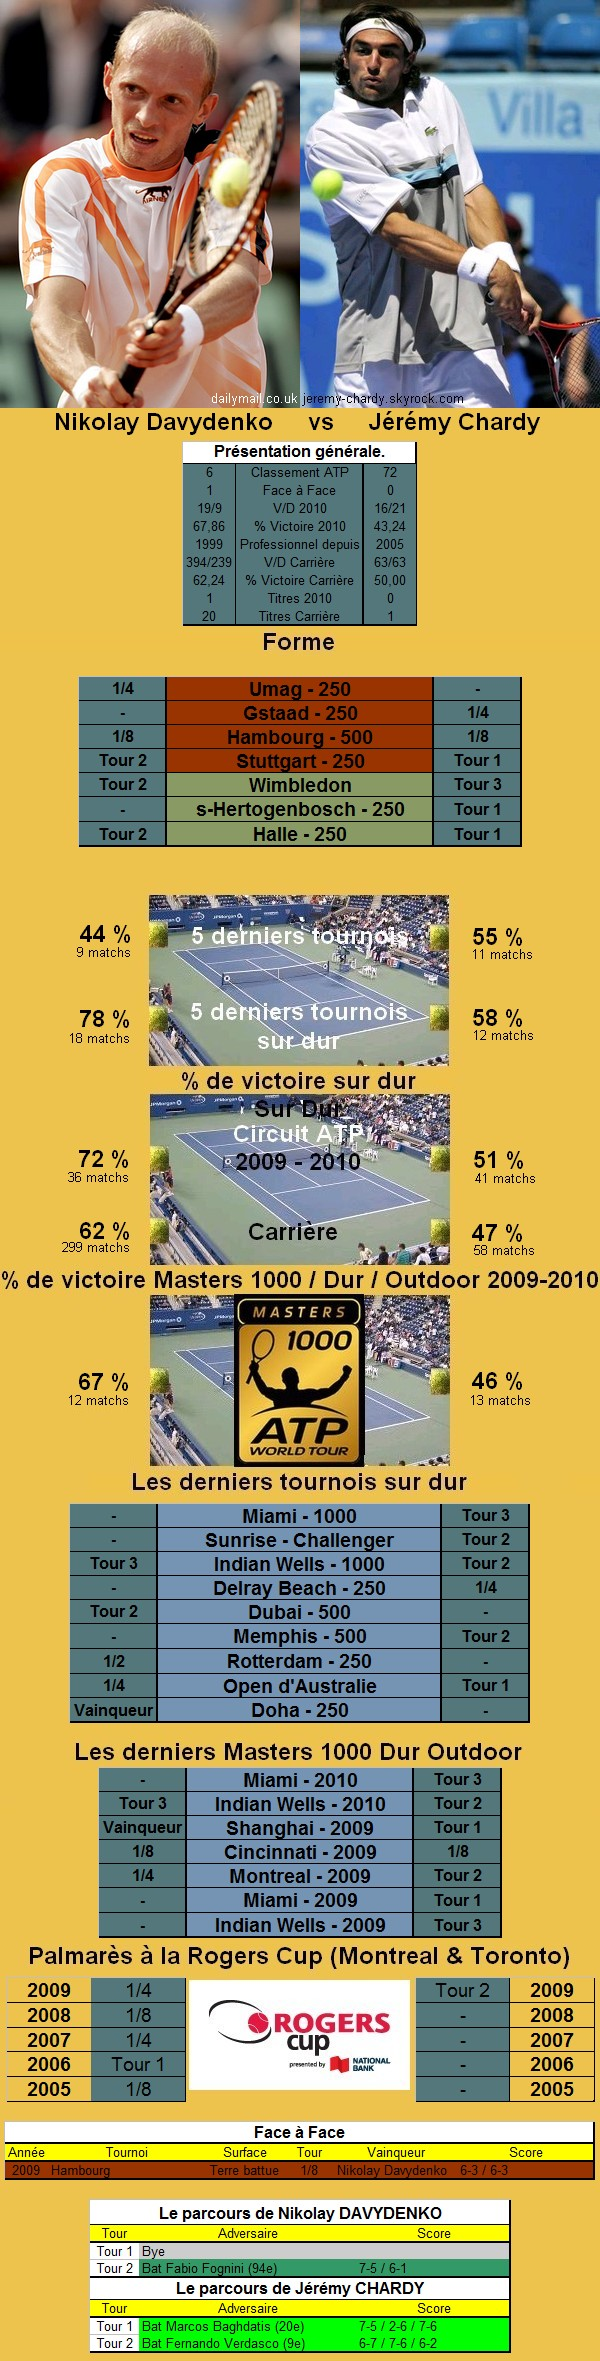 Statistiques tennis de Davydenko contre Chardy à Toronto